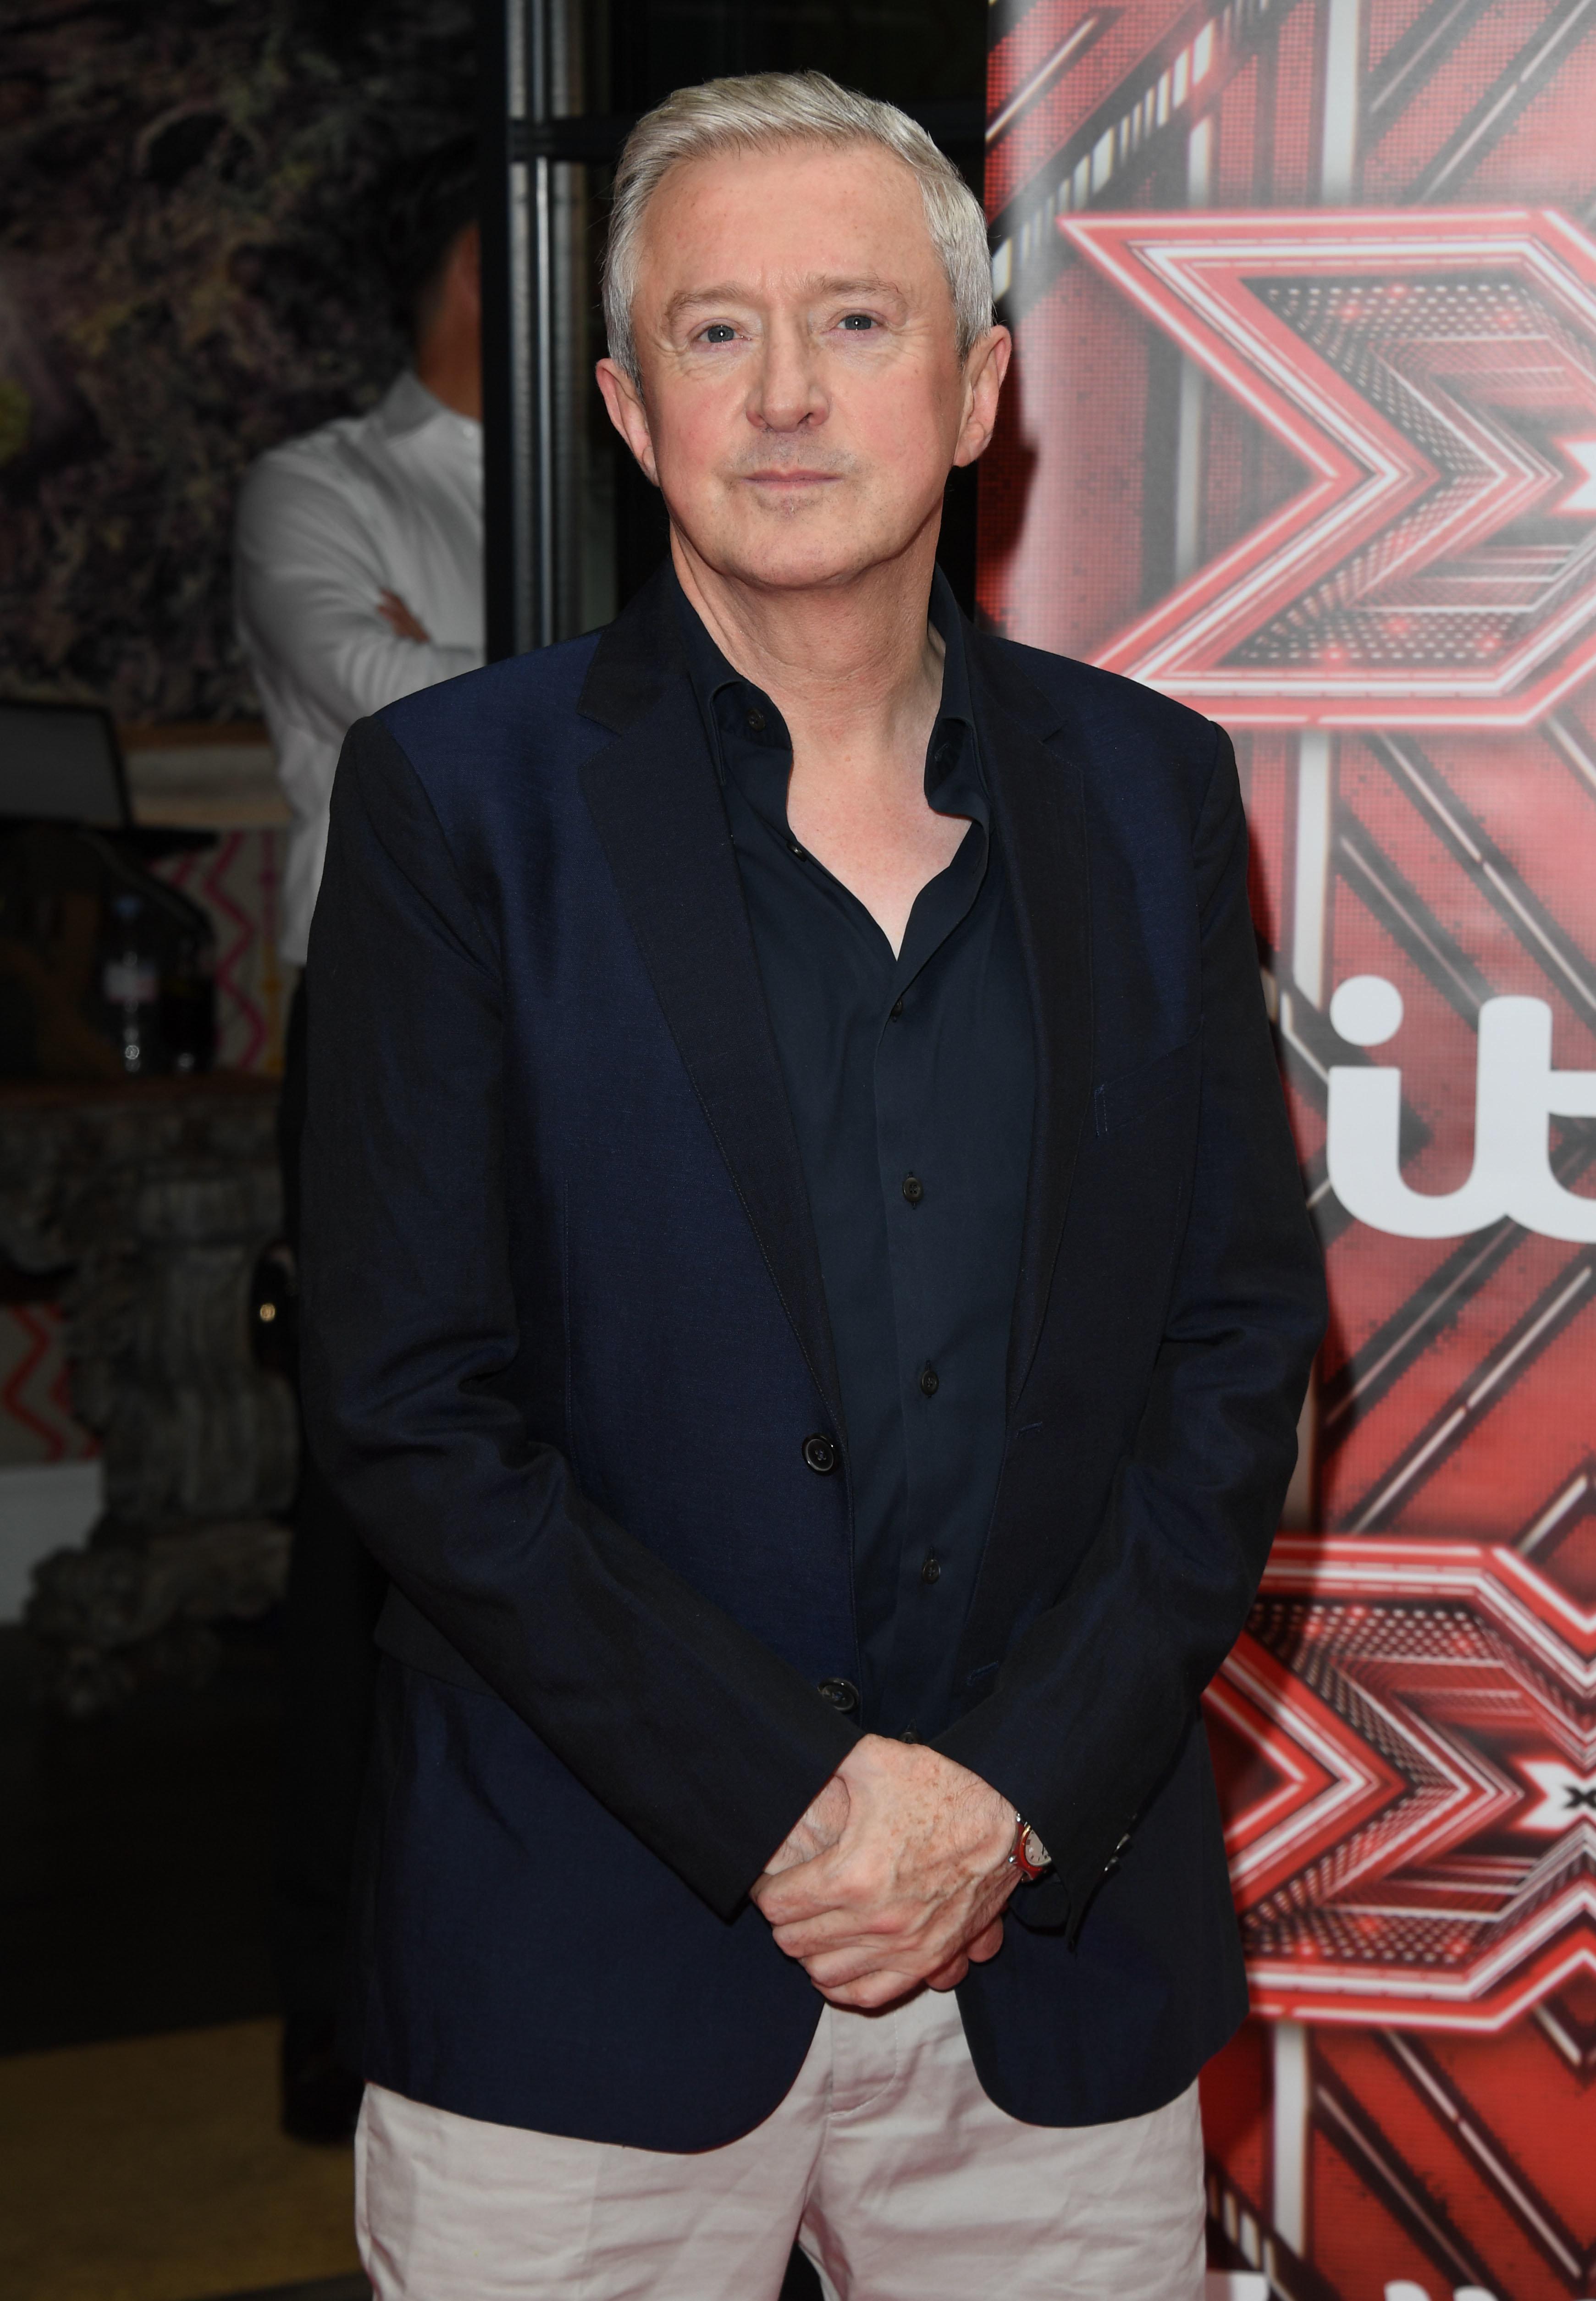 Louis Walsh at the 'X Factor' press